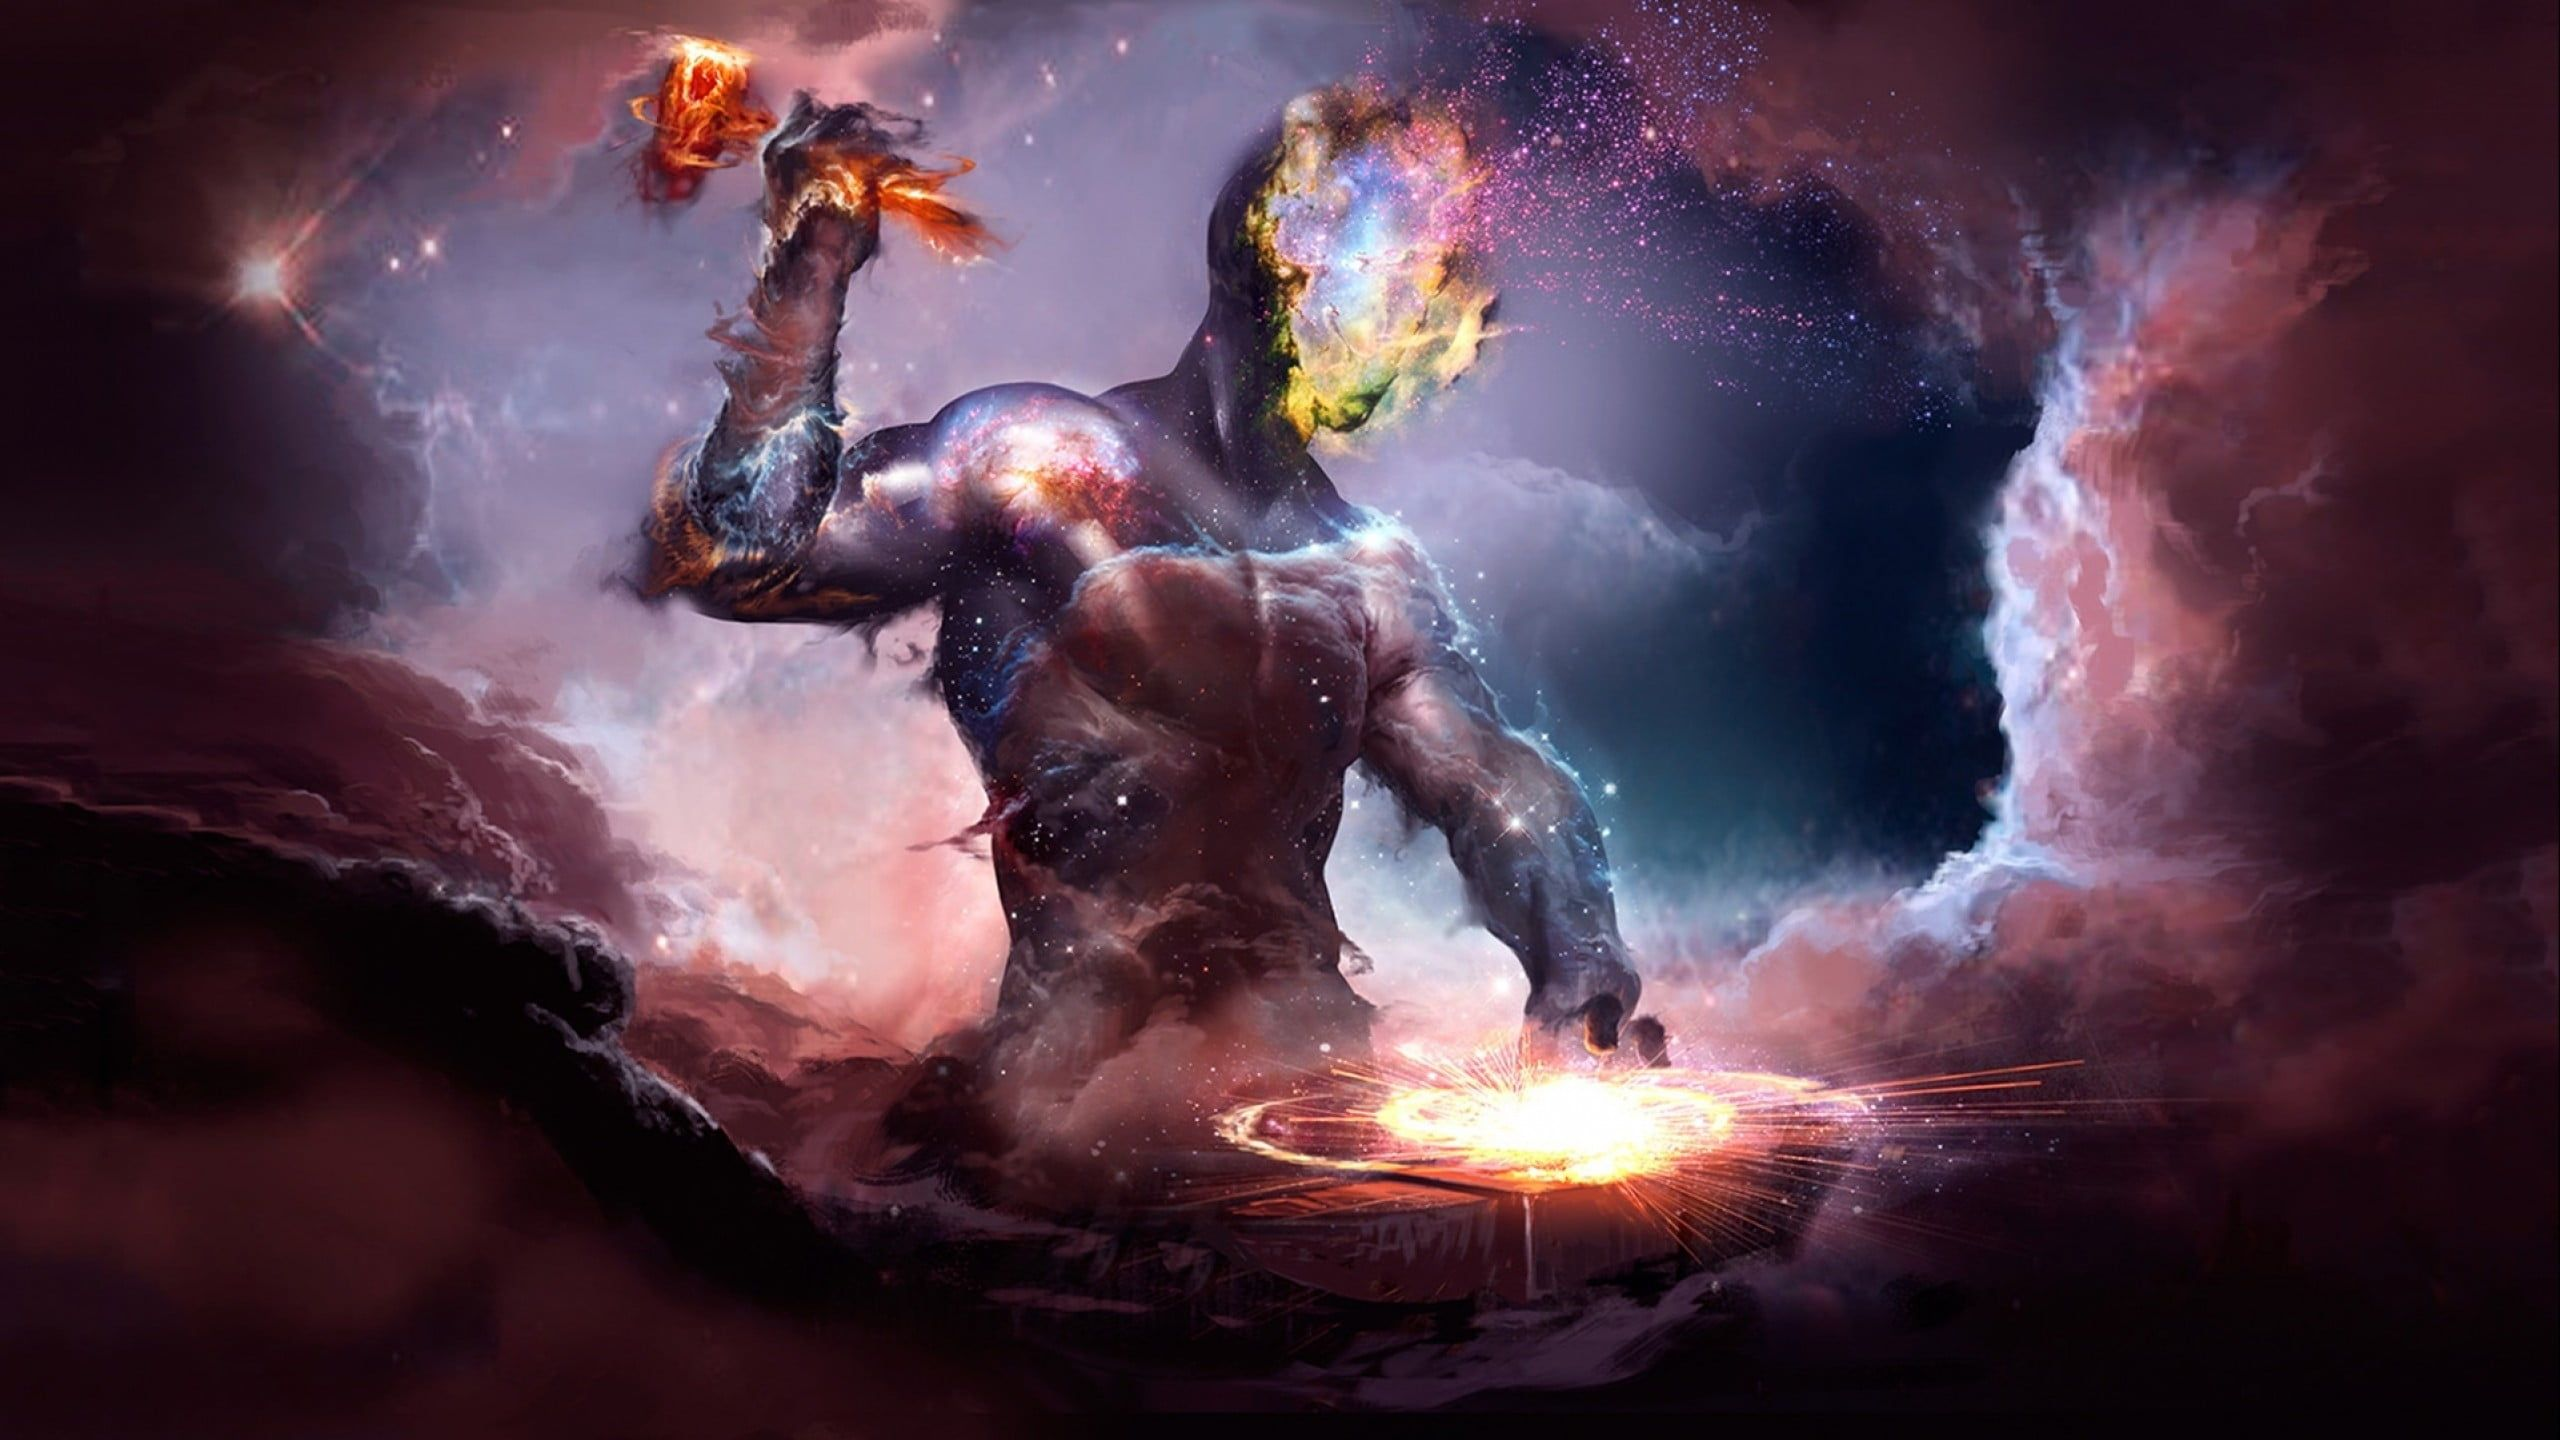 Greek God Illustration Person Forging Weapon On Anvil Artwork Fantasy Art Digital Art Galaxy Space Lif Greek God Illustration God Illustrations Greek Gods